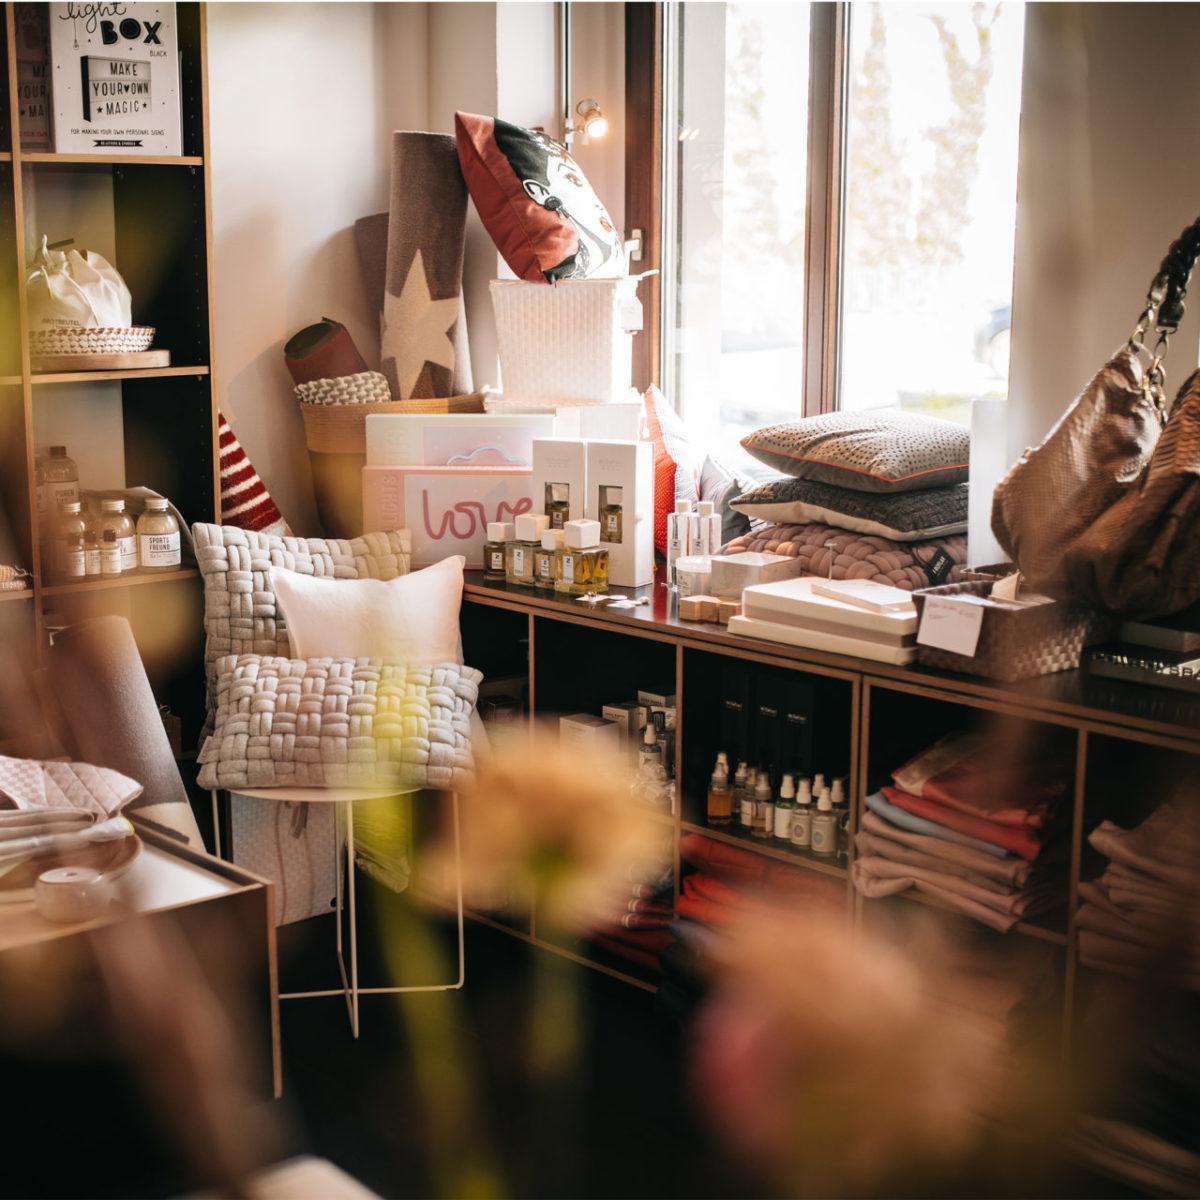 Inside Living Onlineshop Damenmode Damenbekleidung Lifestyle Mode Moenchengladbach